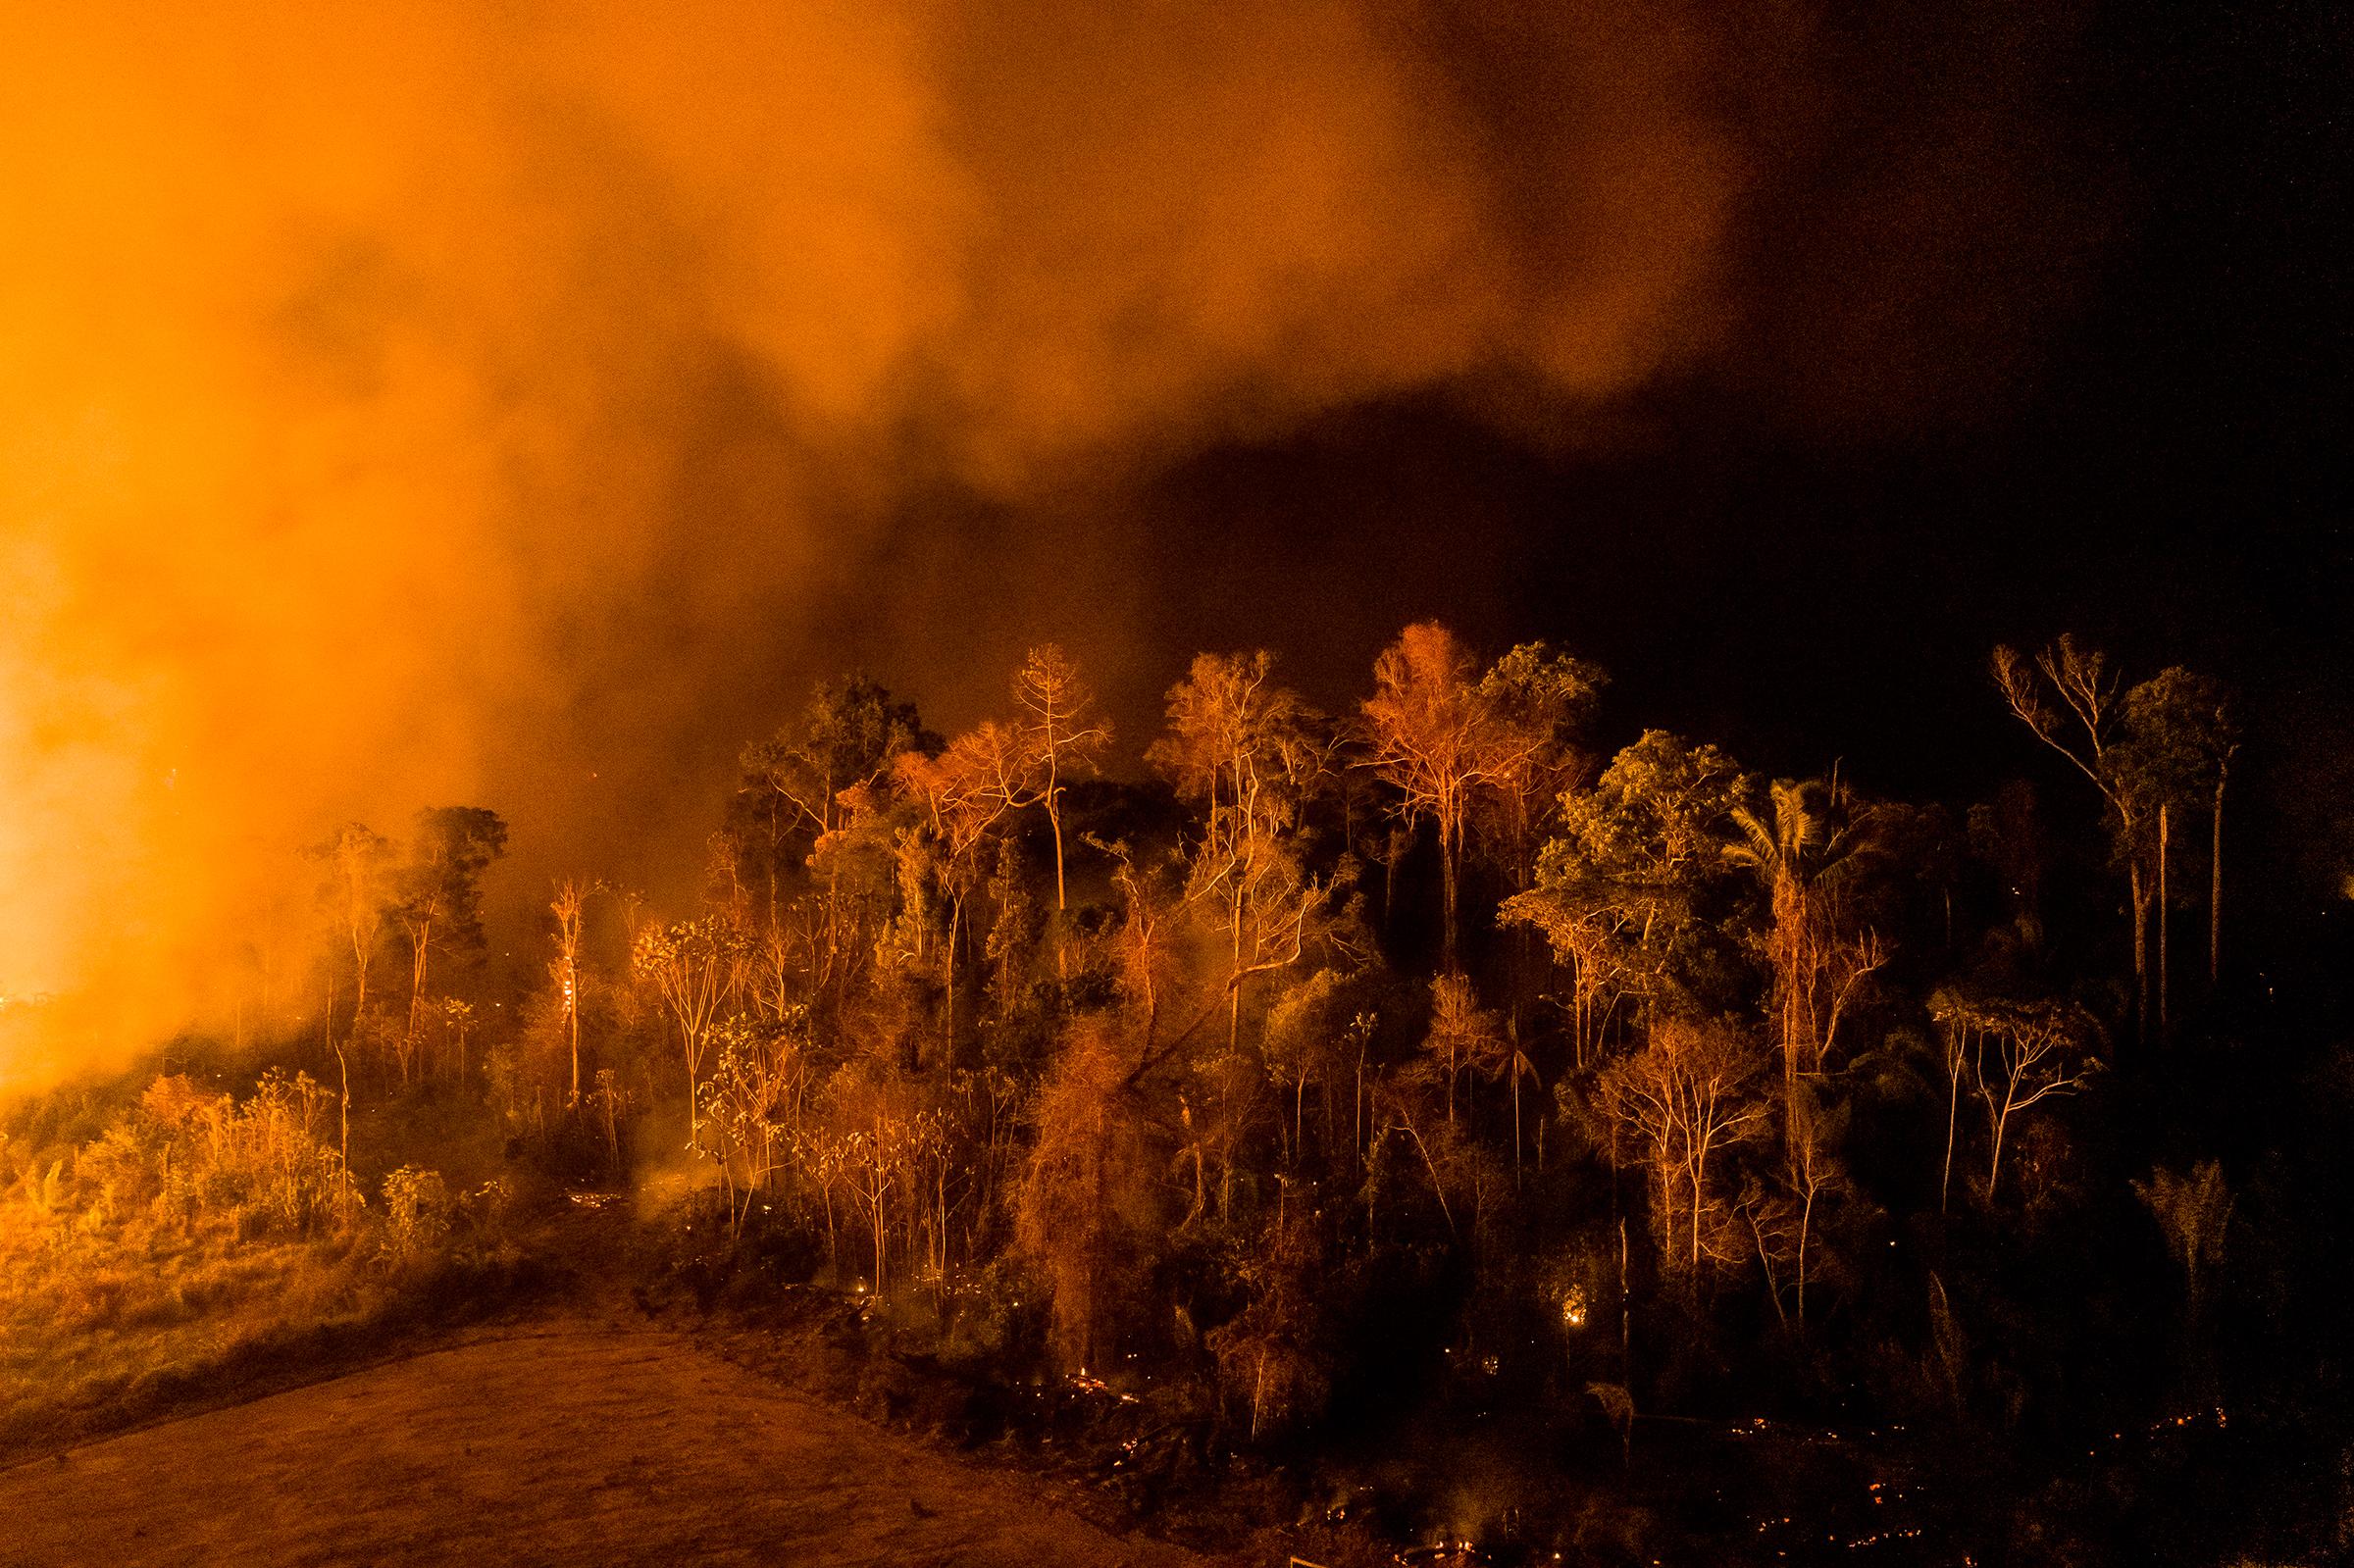 A blaze in the region of Vila Nova Samuel lights up the night sky on Aug. 27.